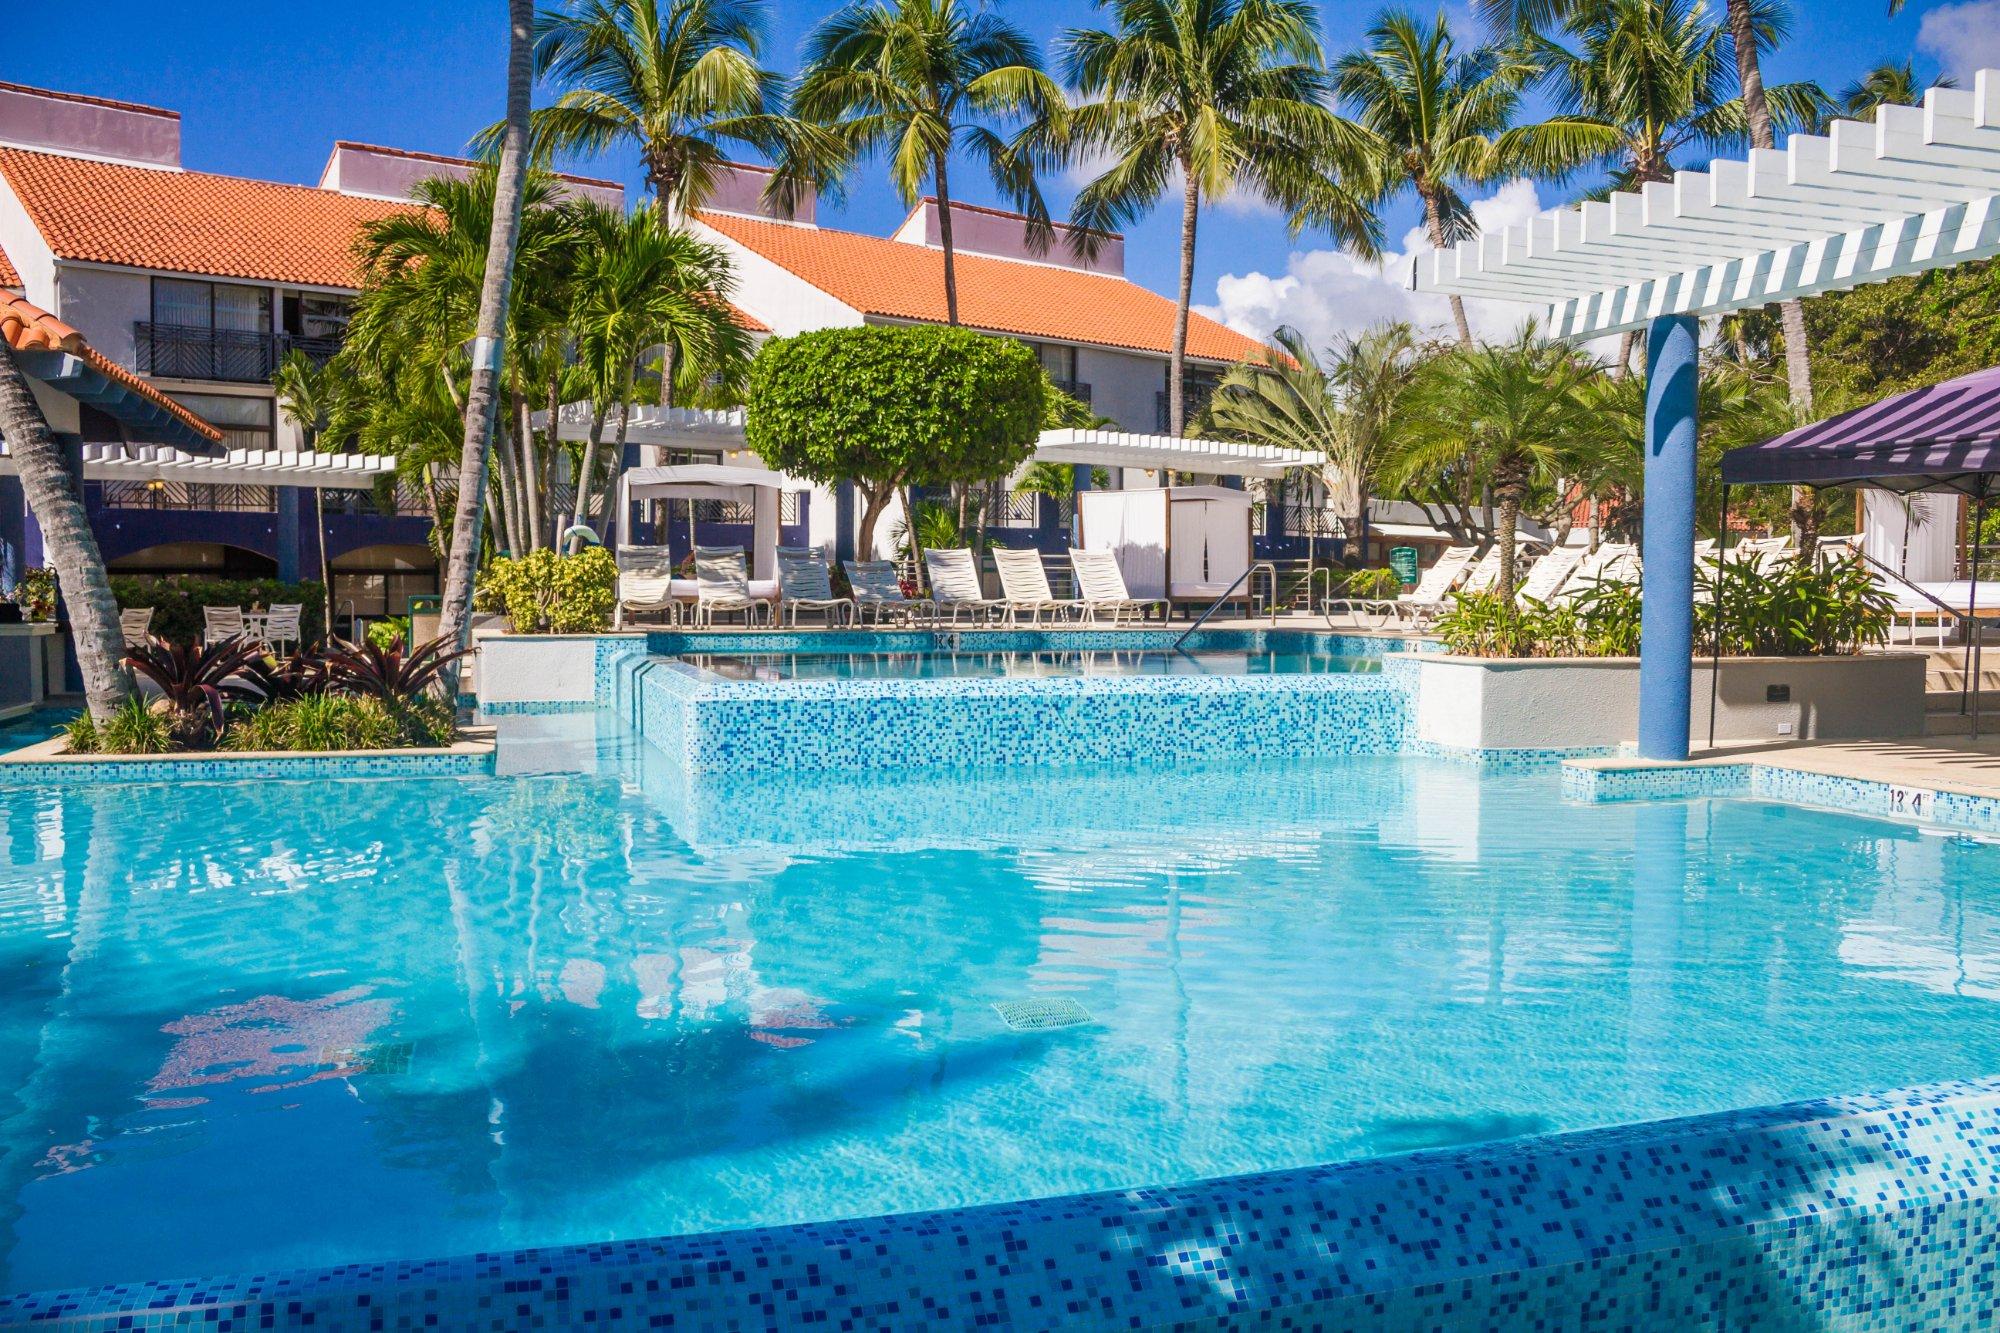 Wyndham garden at palmas del mar casino